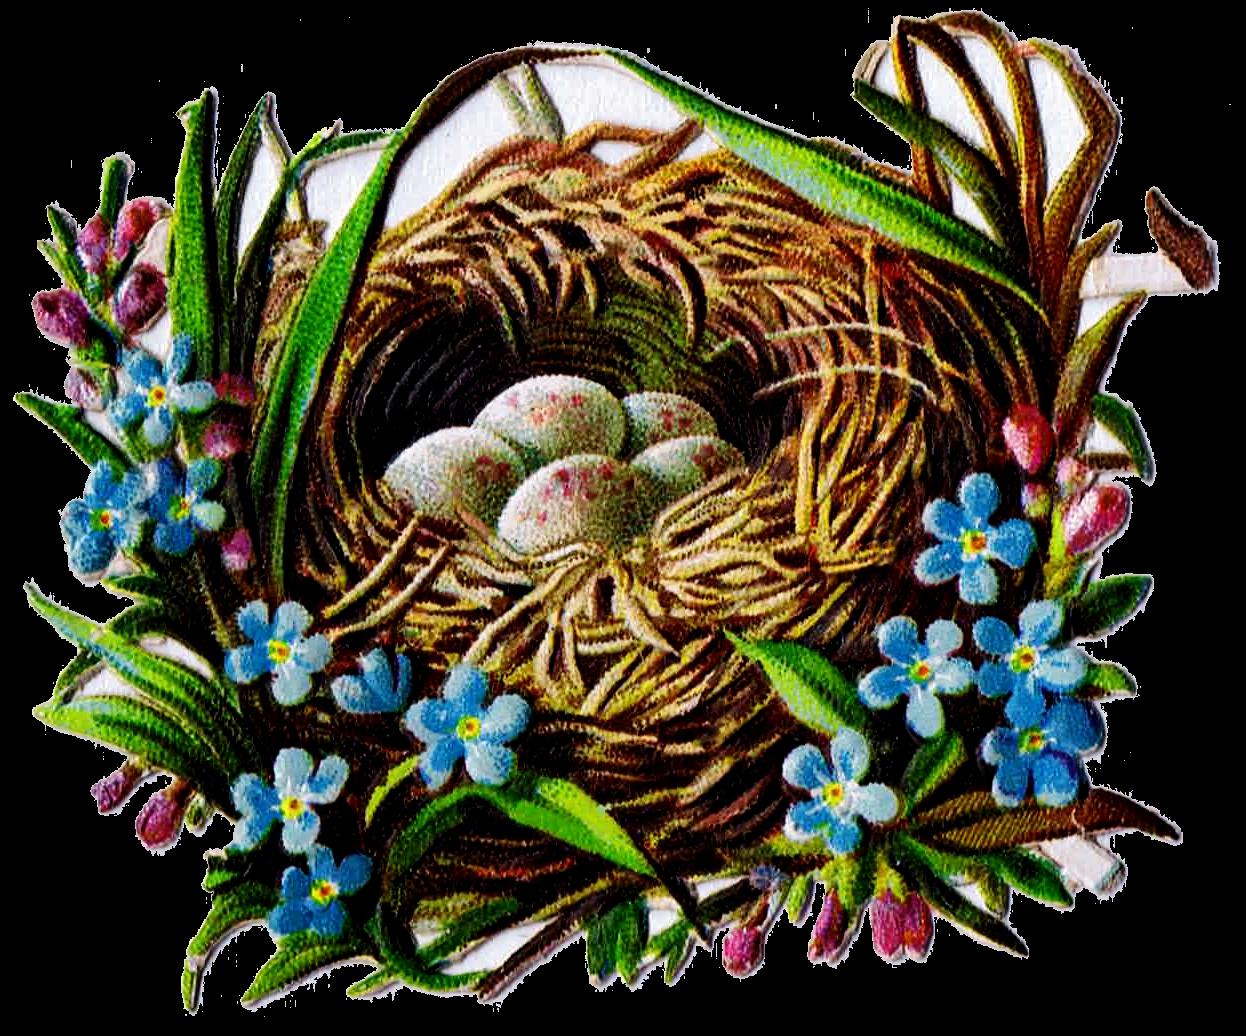 Nest clipart bird's nest. Bird and egg graphics